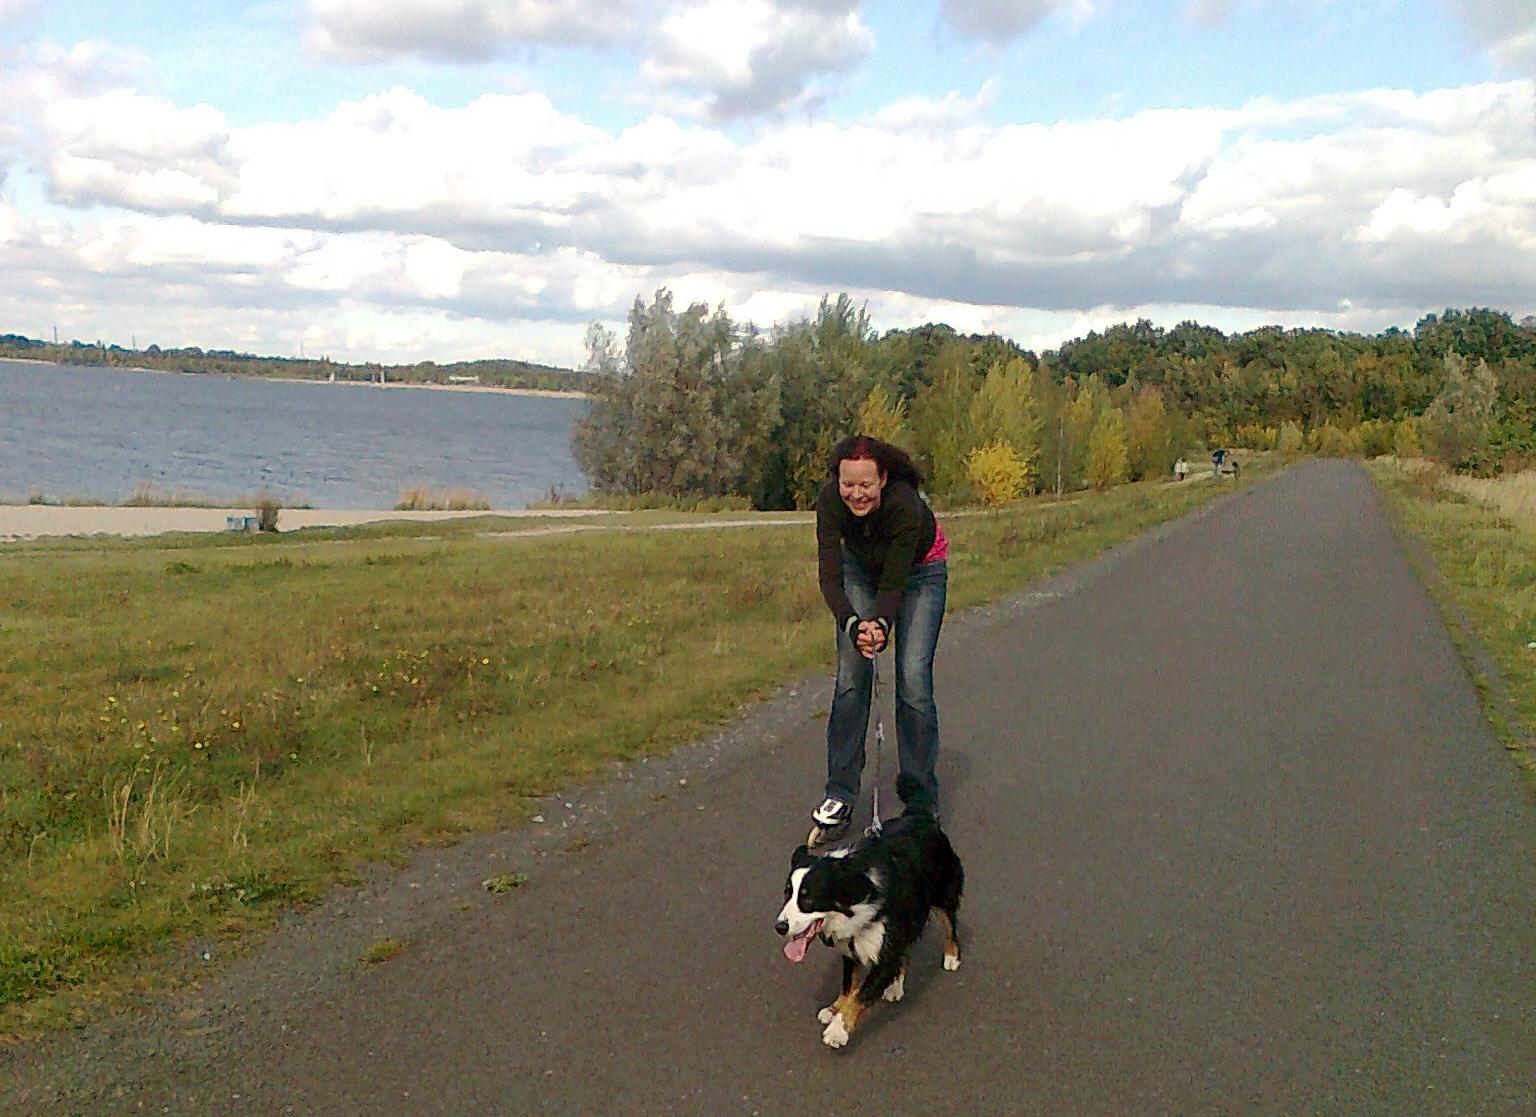 Skaten mit Hund - Cospudener See